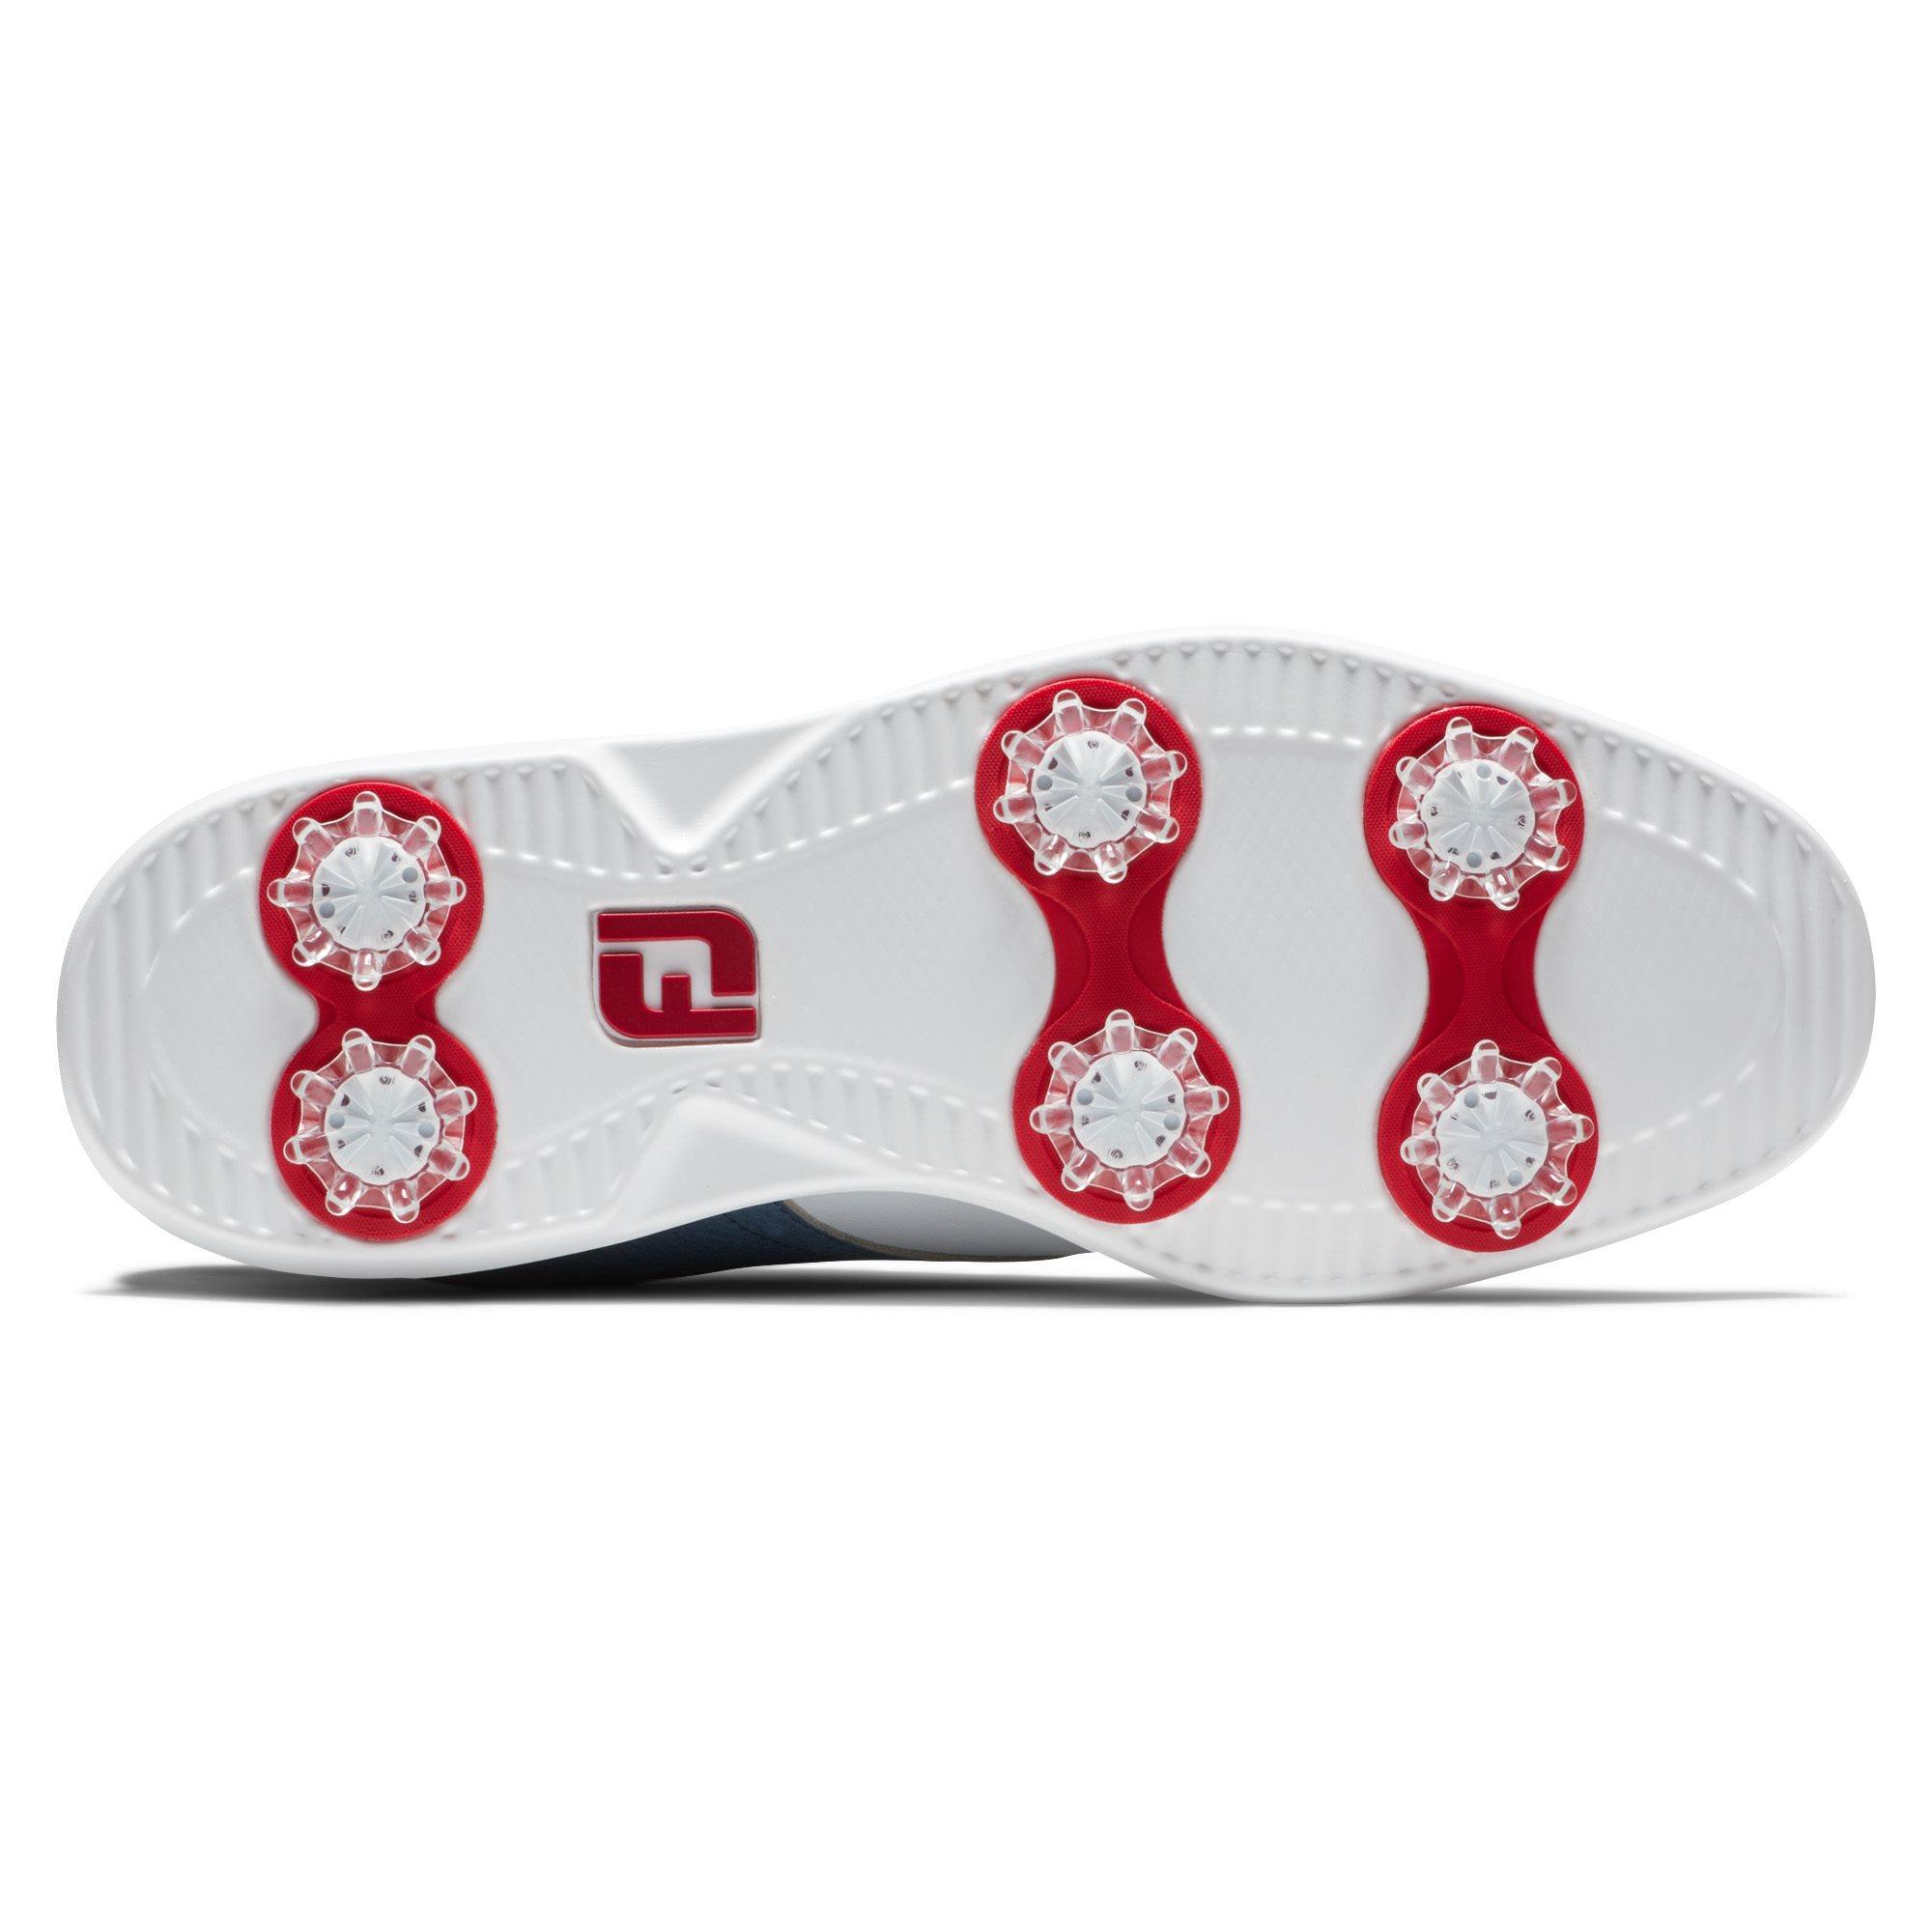 FootJoy dames golfschoenen Traditions wit-blauw